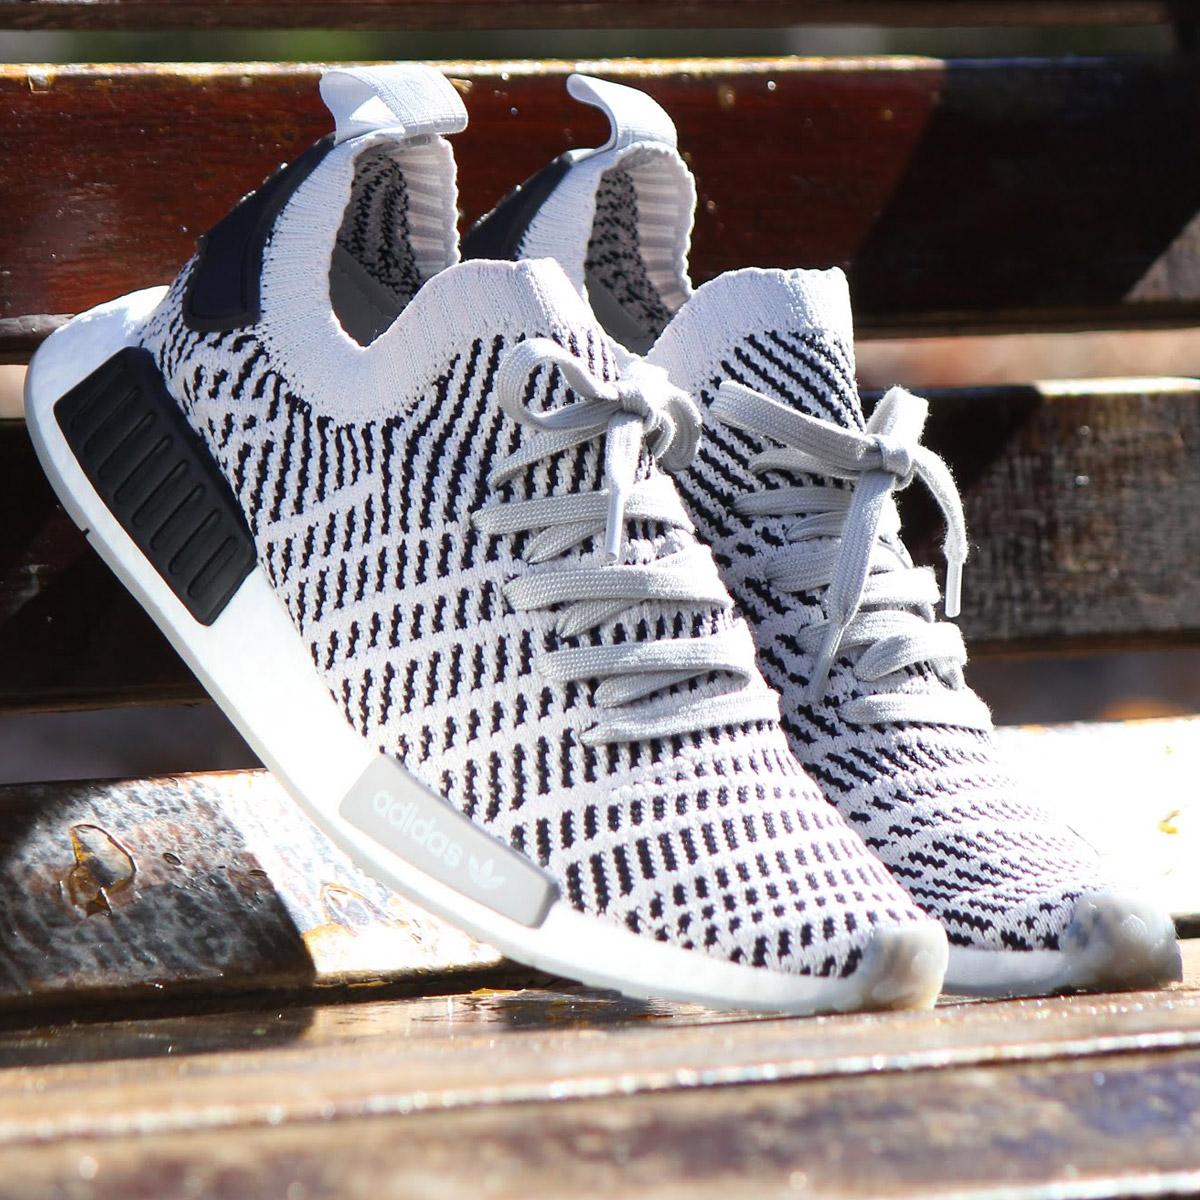 adidas Originals NMD_R1 STLT PK (アディダス オリジナルス エヌエムディー R1 STLT PK) Grey Two/Grey One/Core Black【メンズ レディース スニーカー】18SS-S